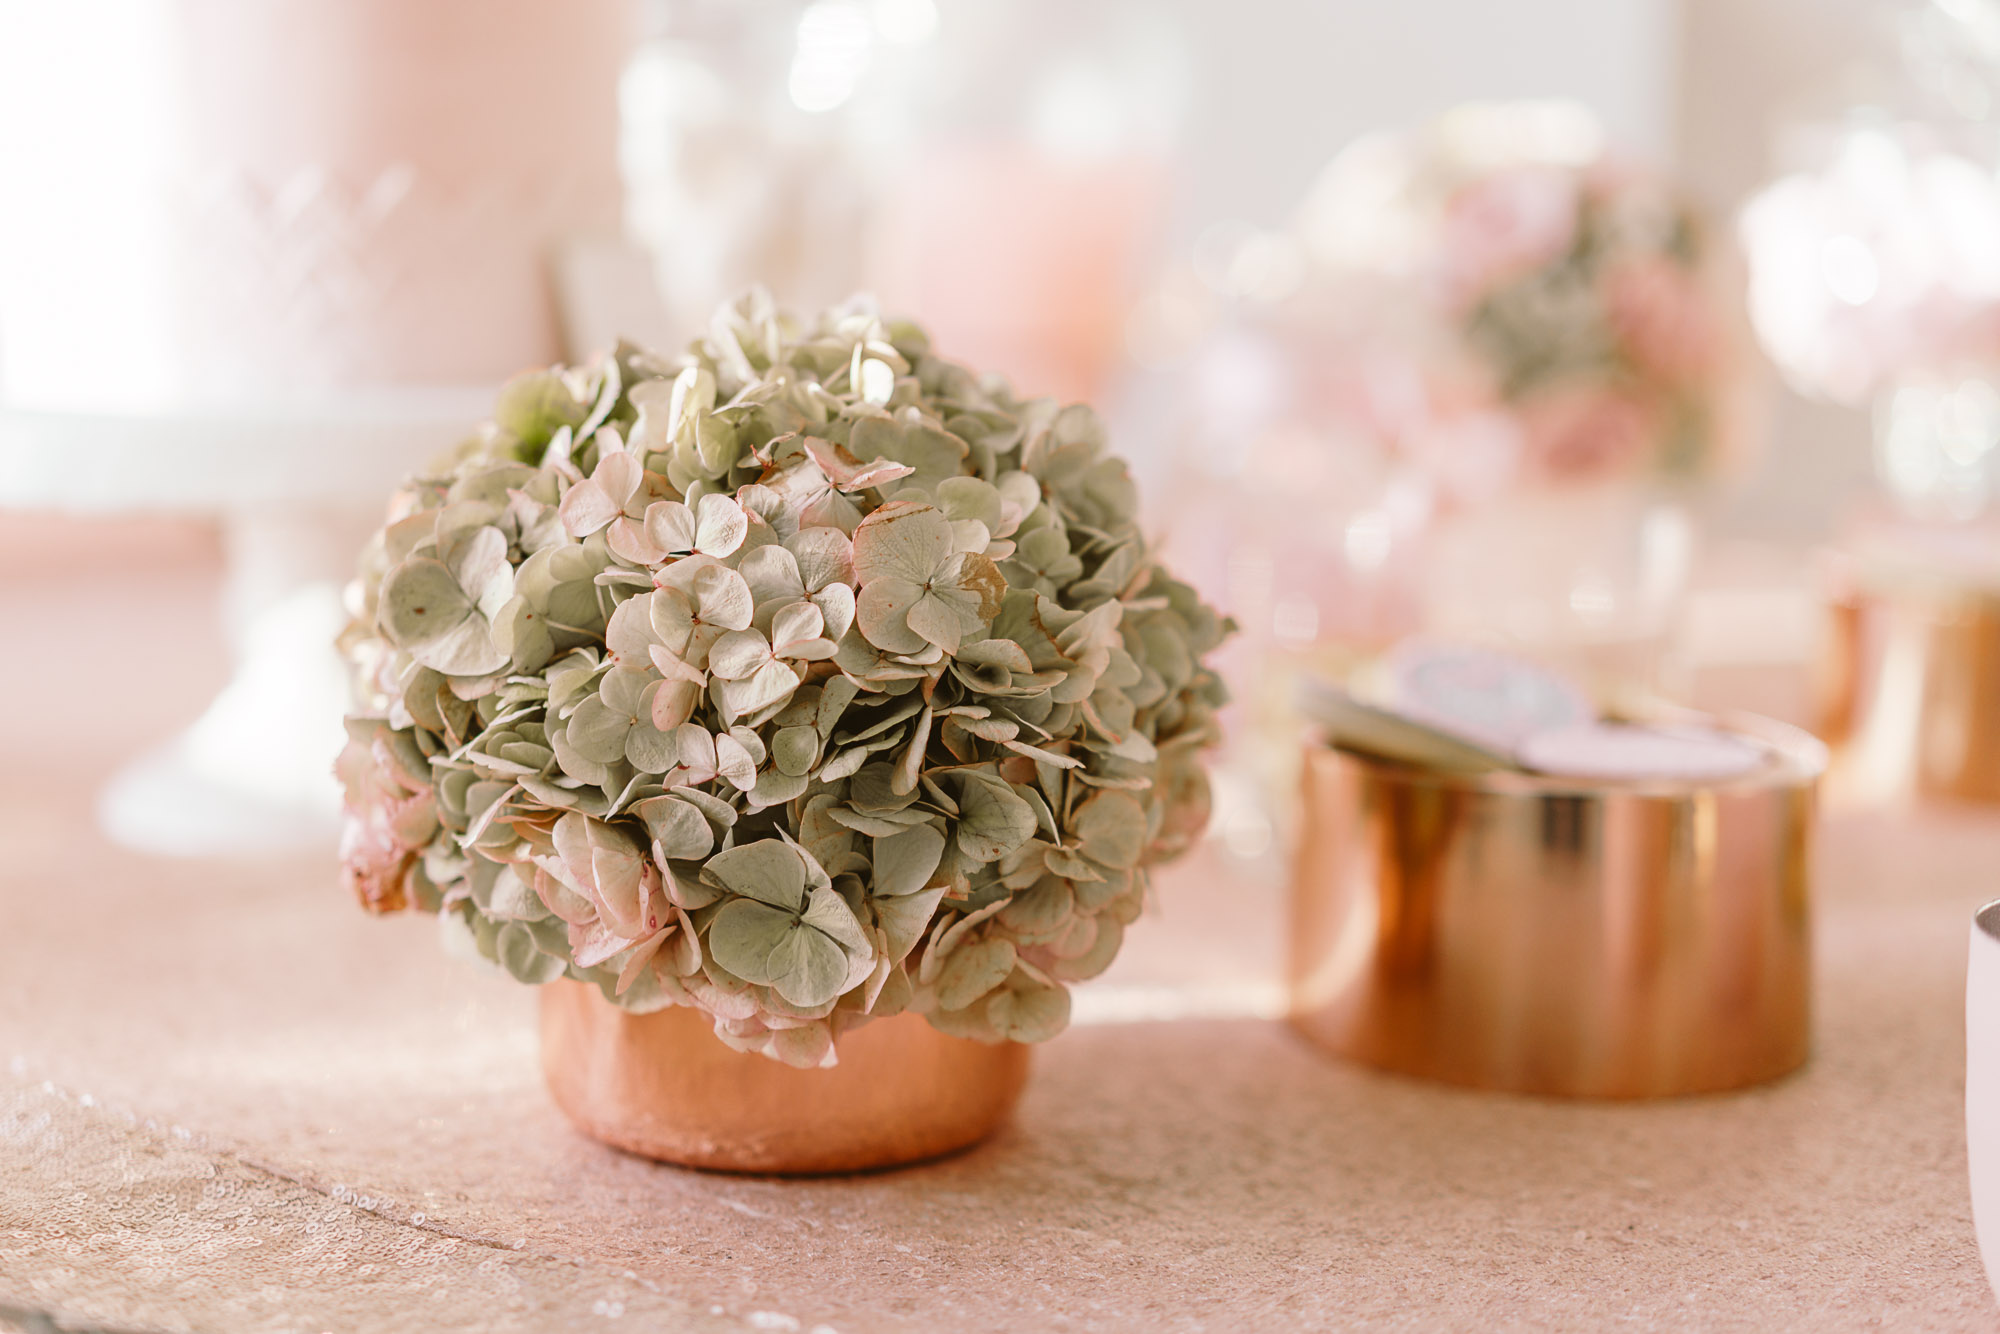 Hortensien Kupfervasen getrocknet Tischdeko Rosa Pastell